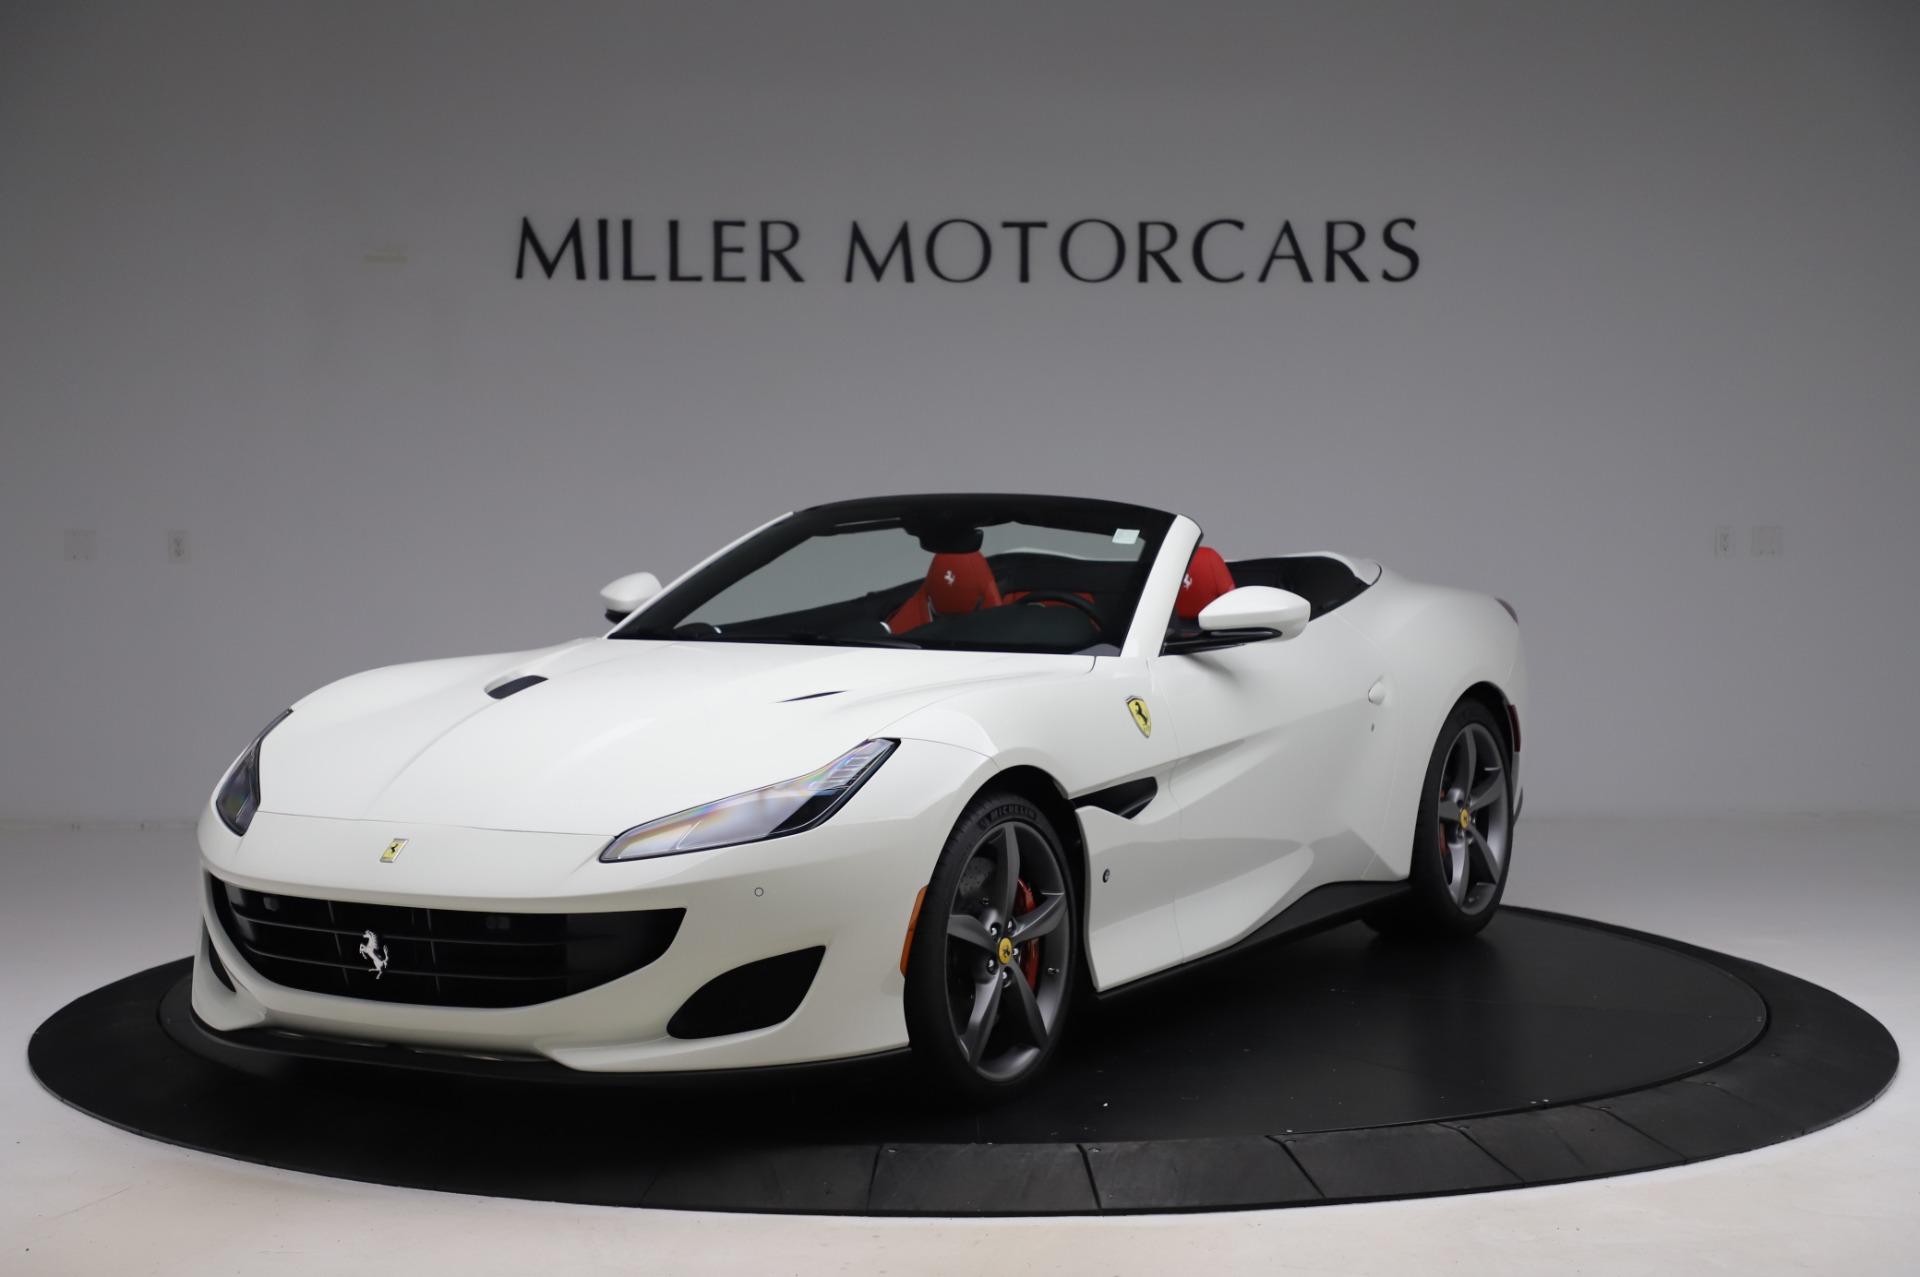 Used 2020 Ferrari Portofino Base for sale Call for price at Rolls-Royce Motor Cars Greenwich in Greenwich CT 06830 1